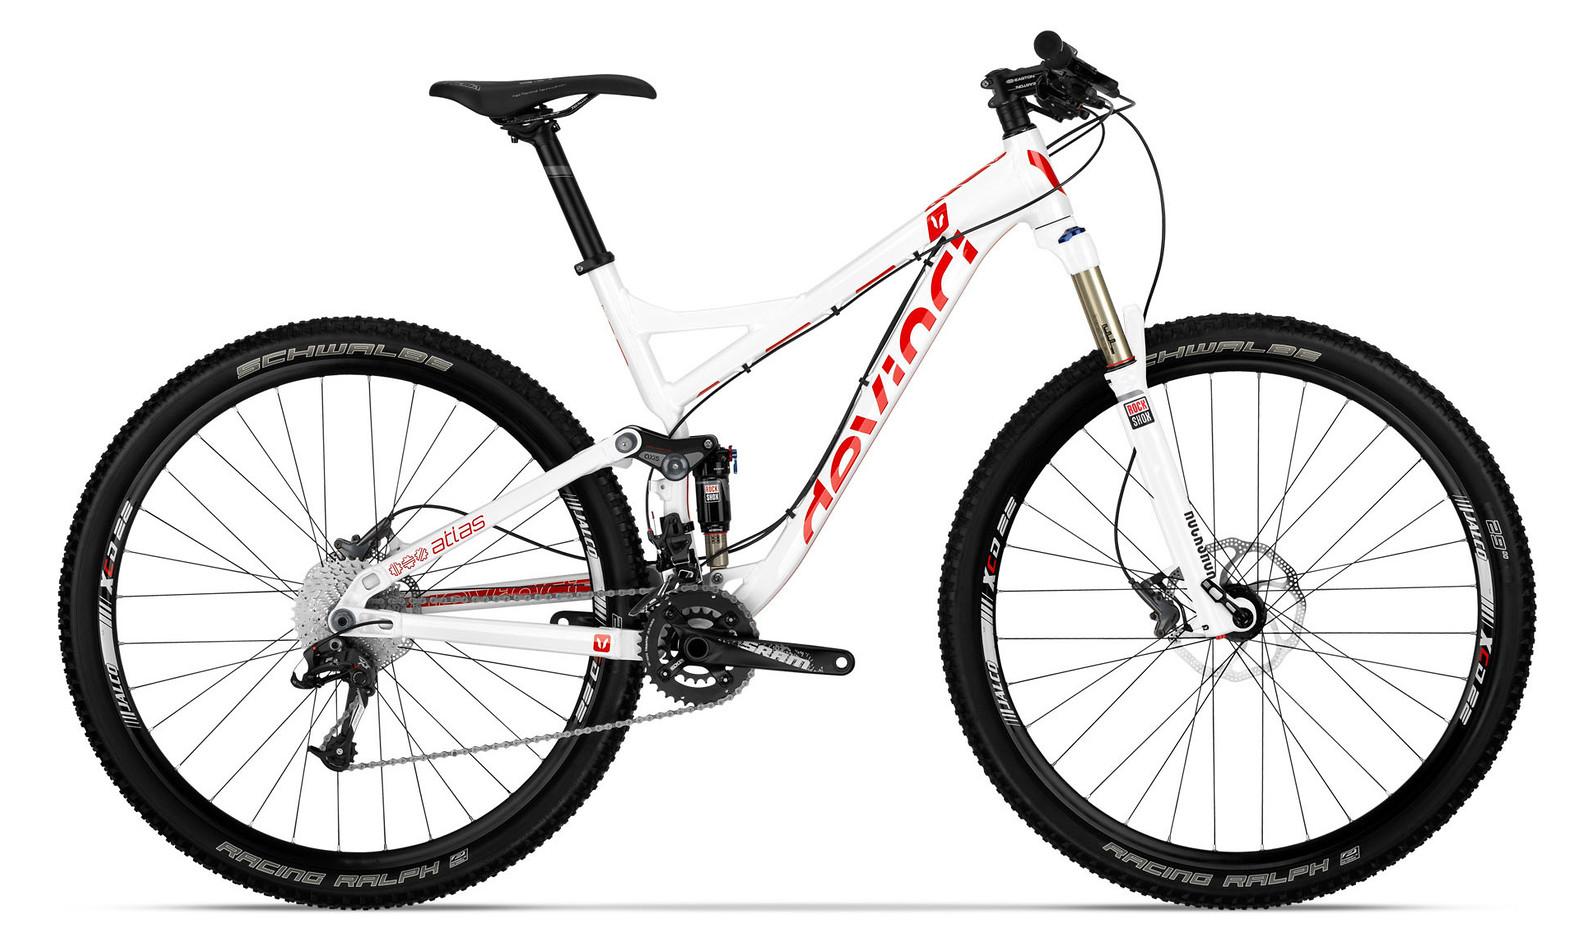 Bike - 2014 Devinci Atlas XP